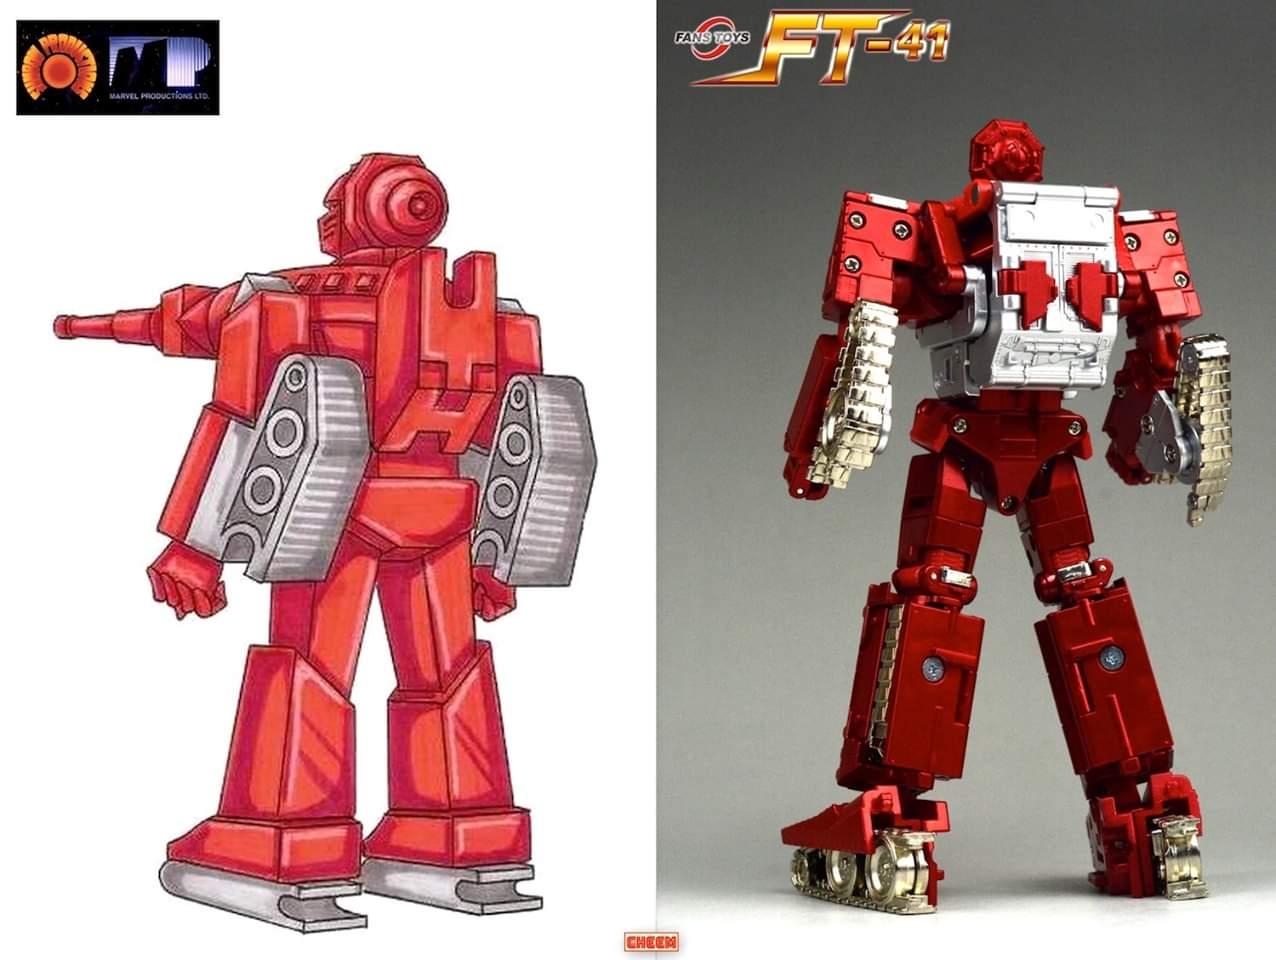 [Fanstoys] Produit Tiers - Minibots MP - Gamme FT - Page 2 KOZ7k0Bw_o